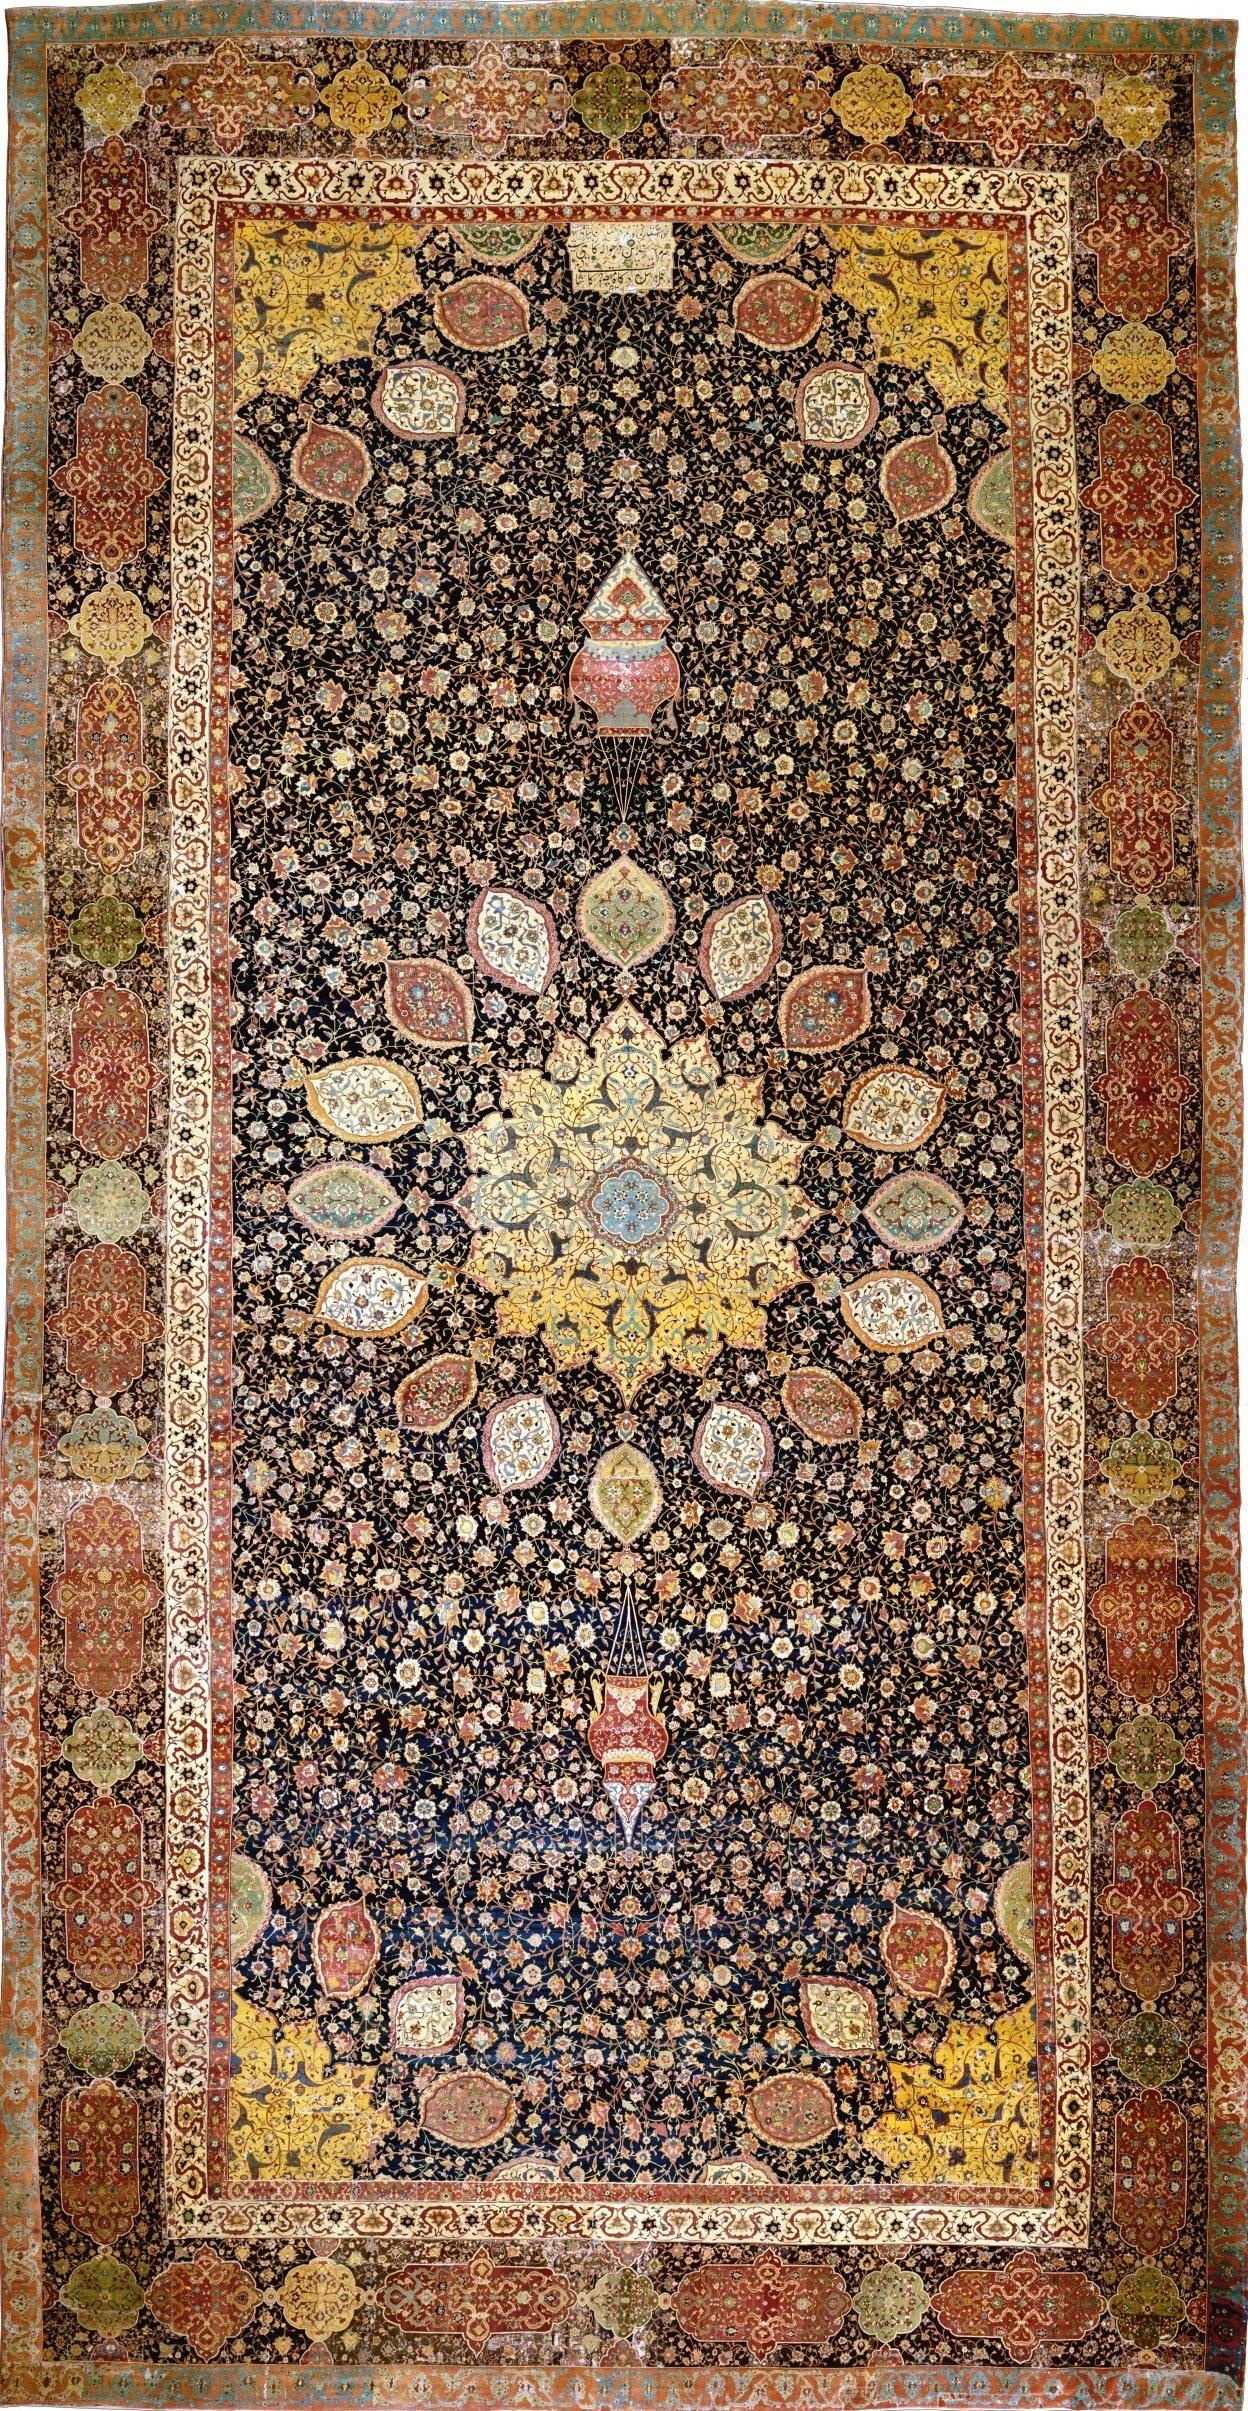 Le tapis Ardabil, Iran, 1539-1540 © Victoria and Albert Museum, London